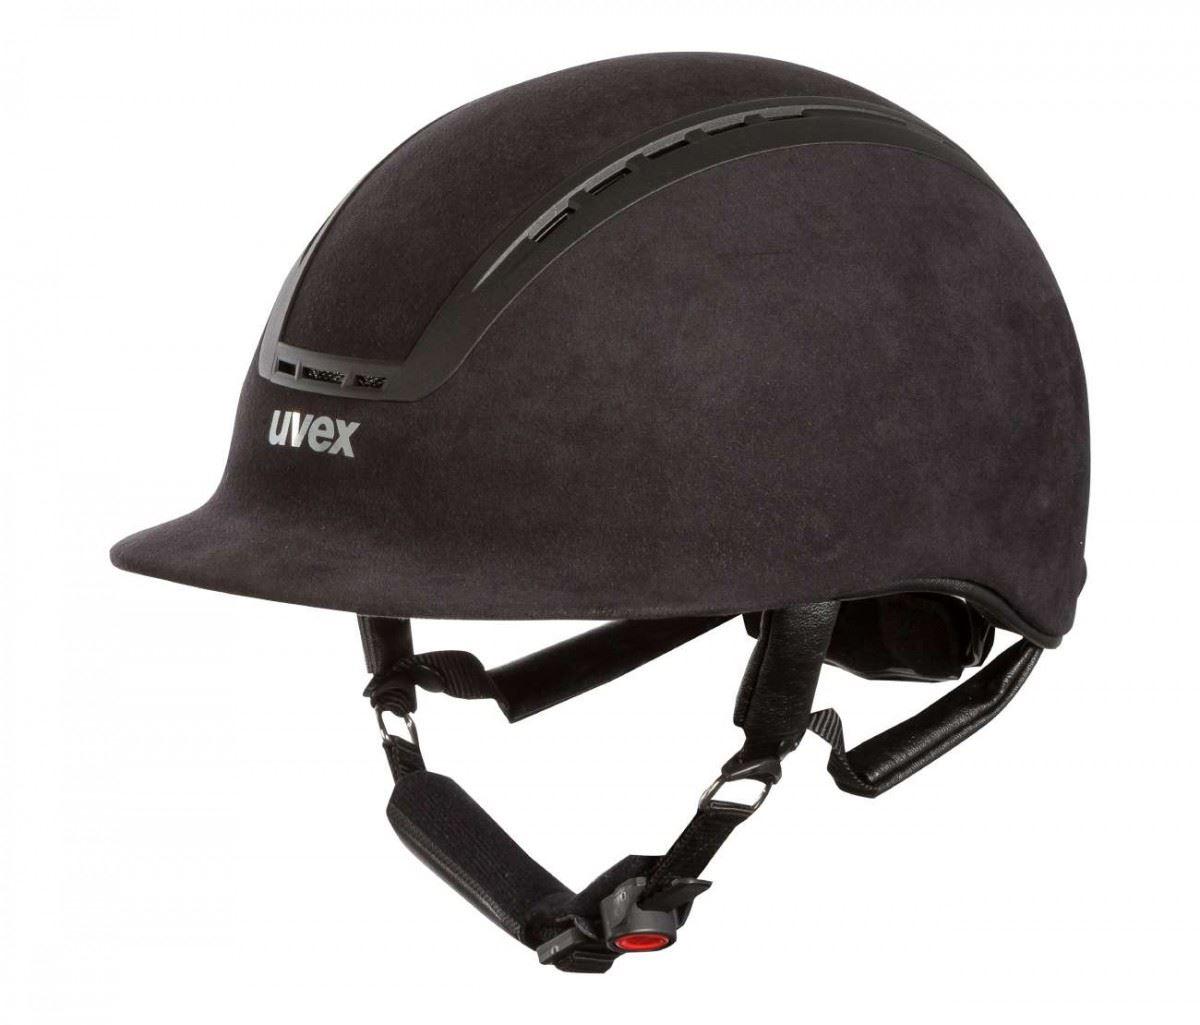 uvex suxxeed velour adjustable helmet vg1 kitemarked ebay. Black Bedroom Furniture Sets. Home Design Ideas